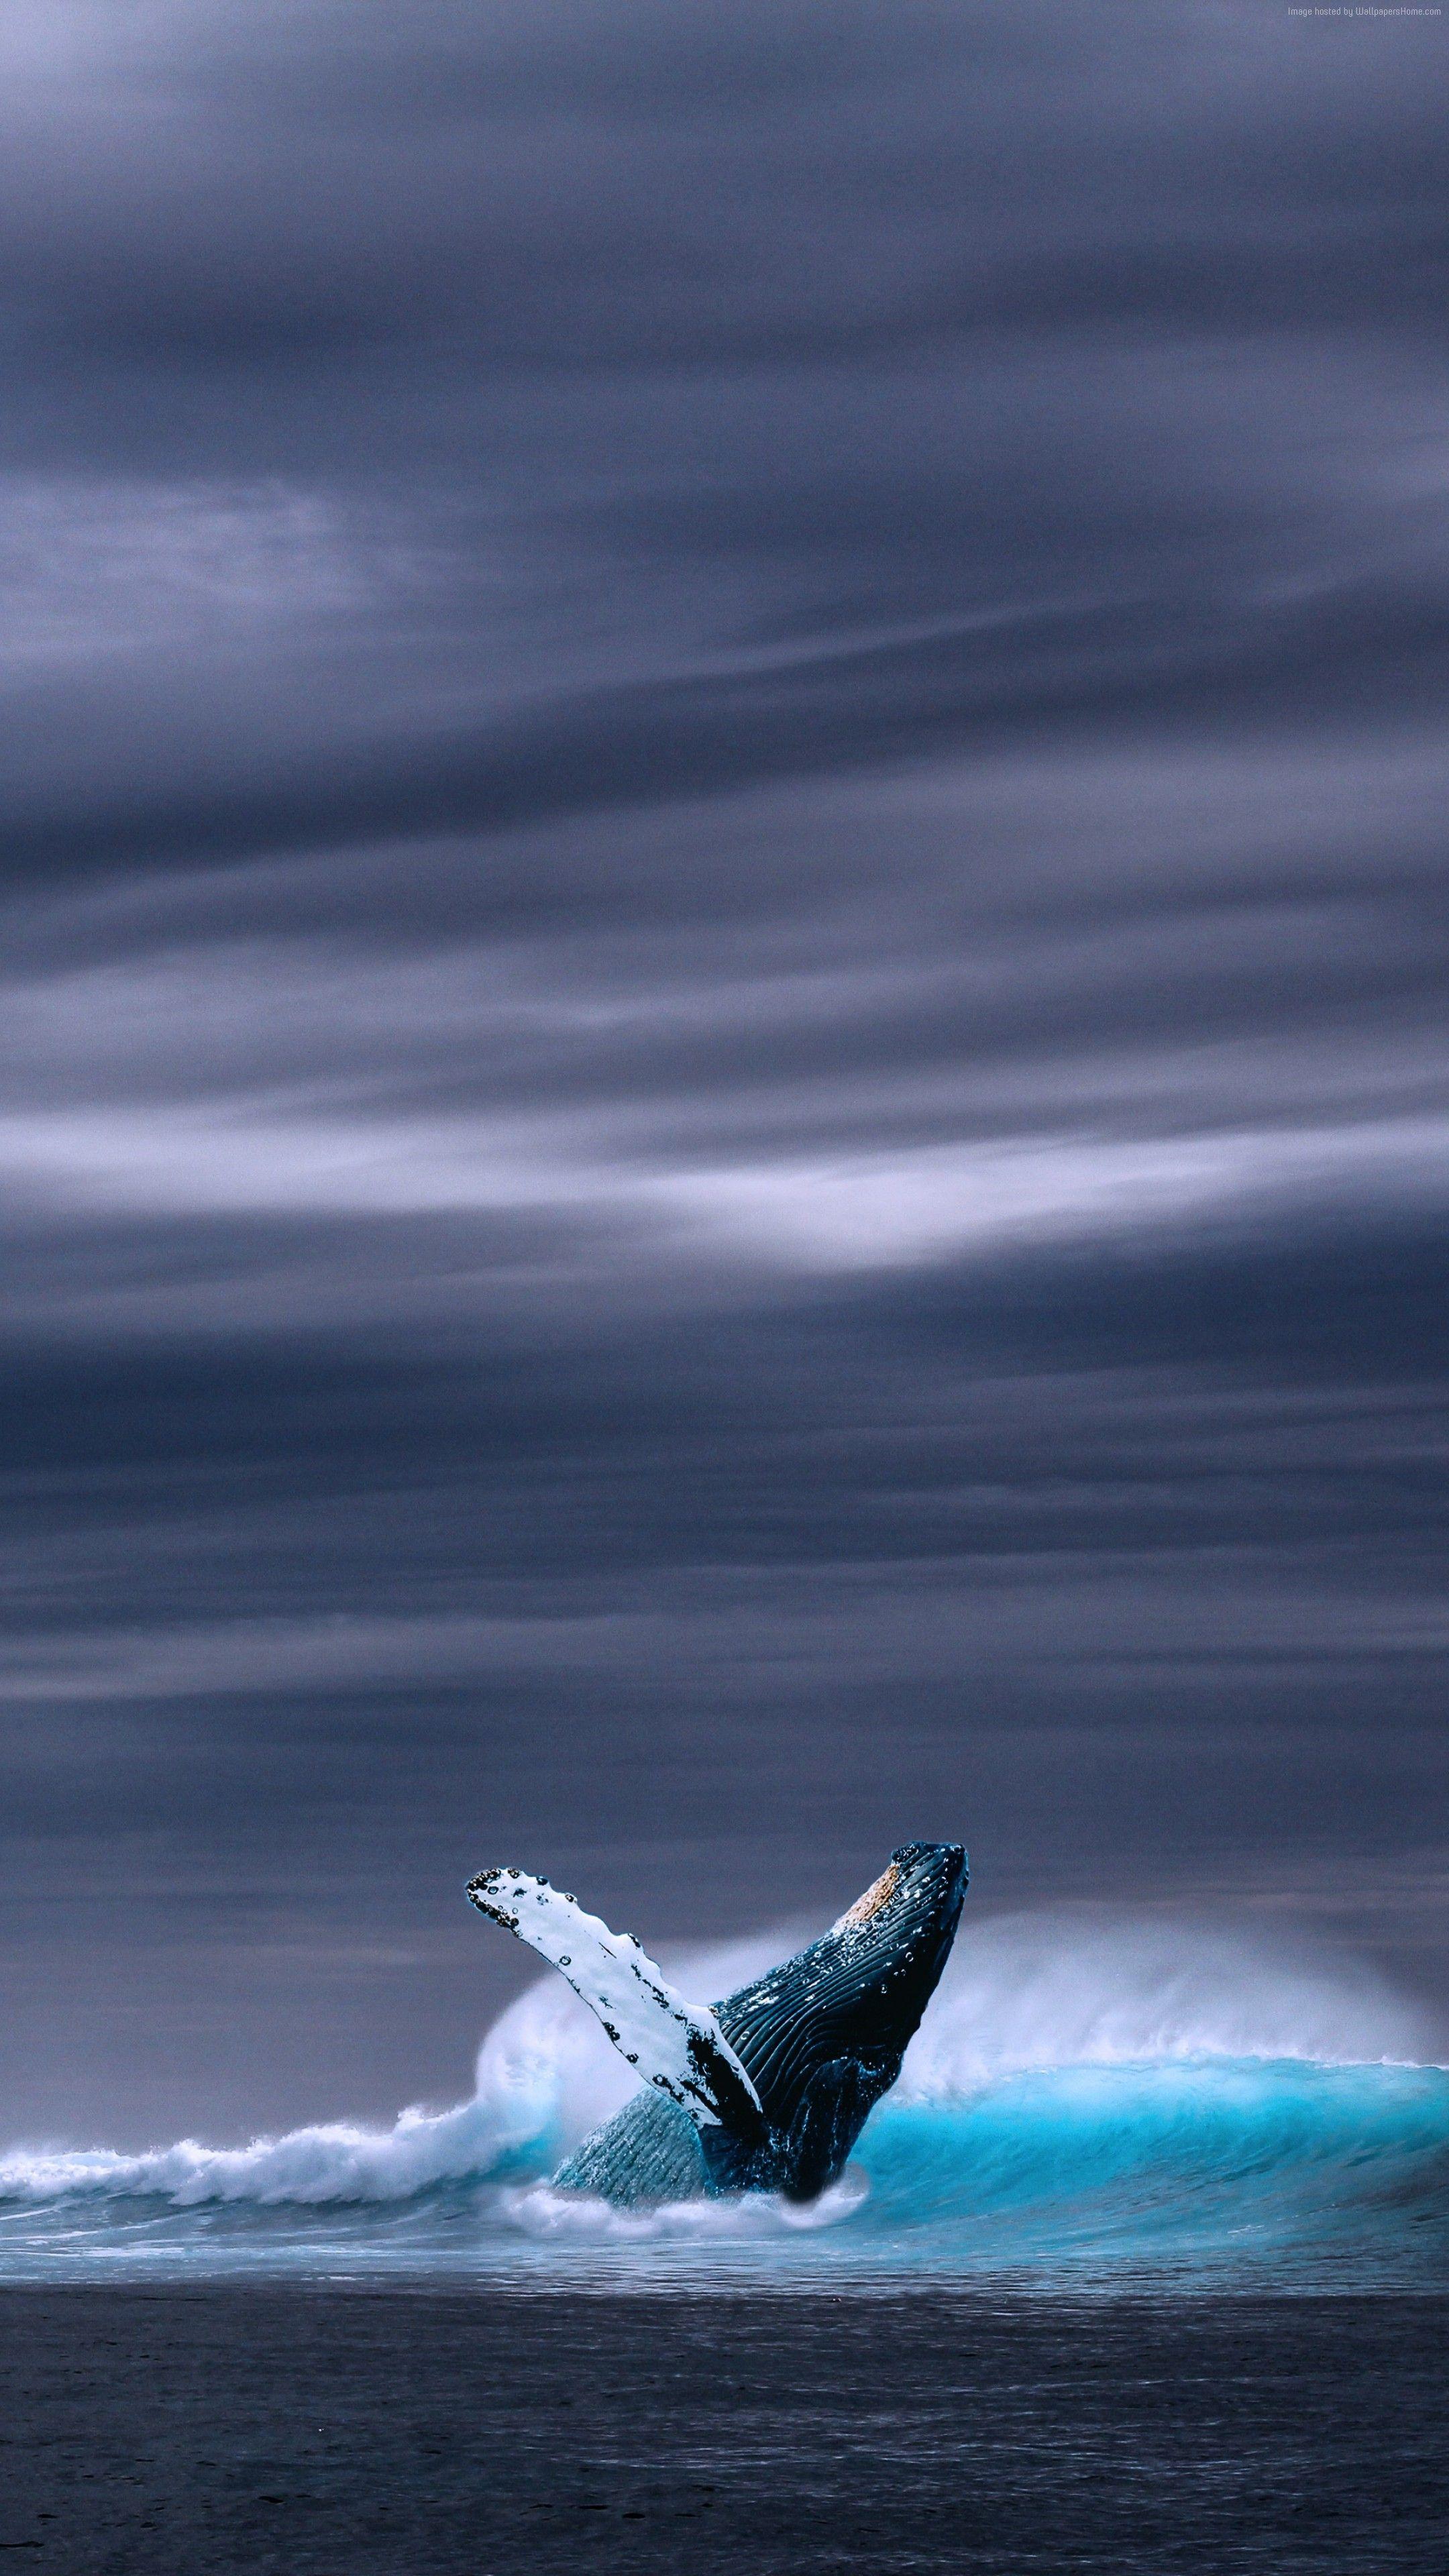 Whale Http Wallpaperhd Site Whale 6192 5k Ocean Sky 5k Ocean Sky Whale Pictures Ocean Animals Beautiful Sea Creatures